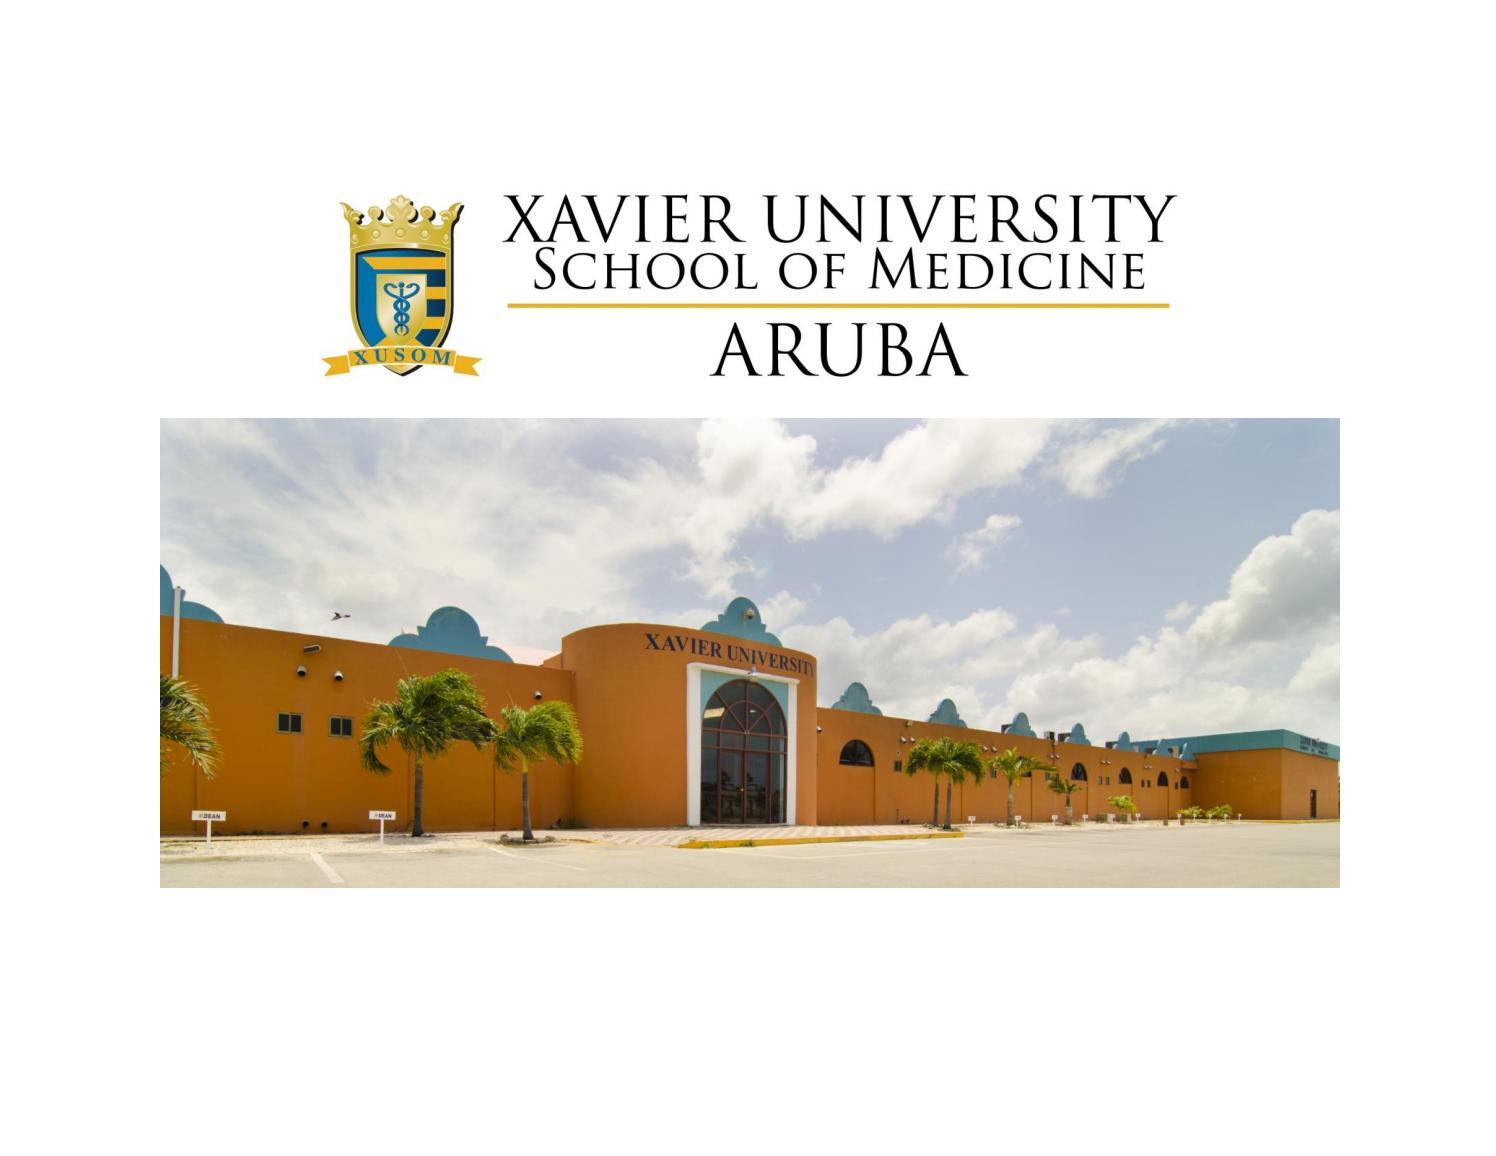 School flip book by Xavier University School of Medicine - issuu